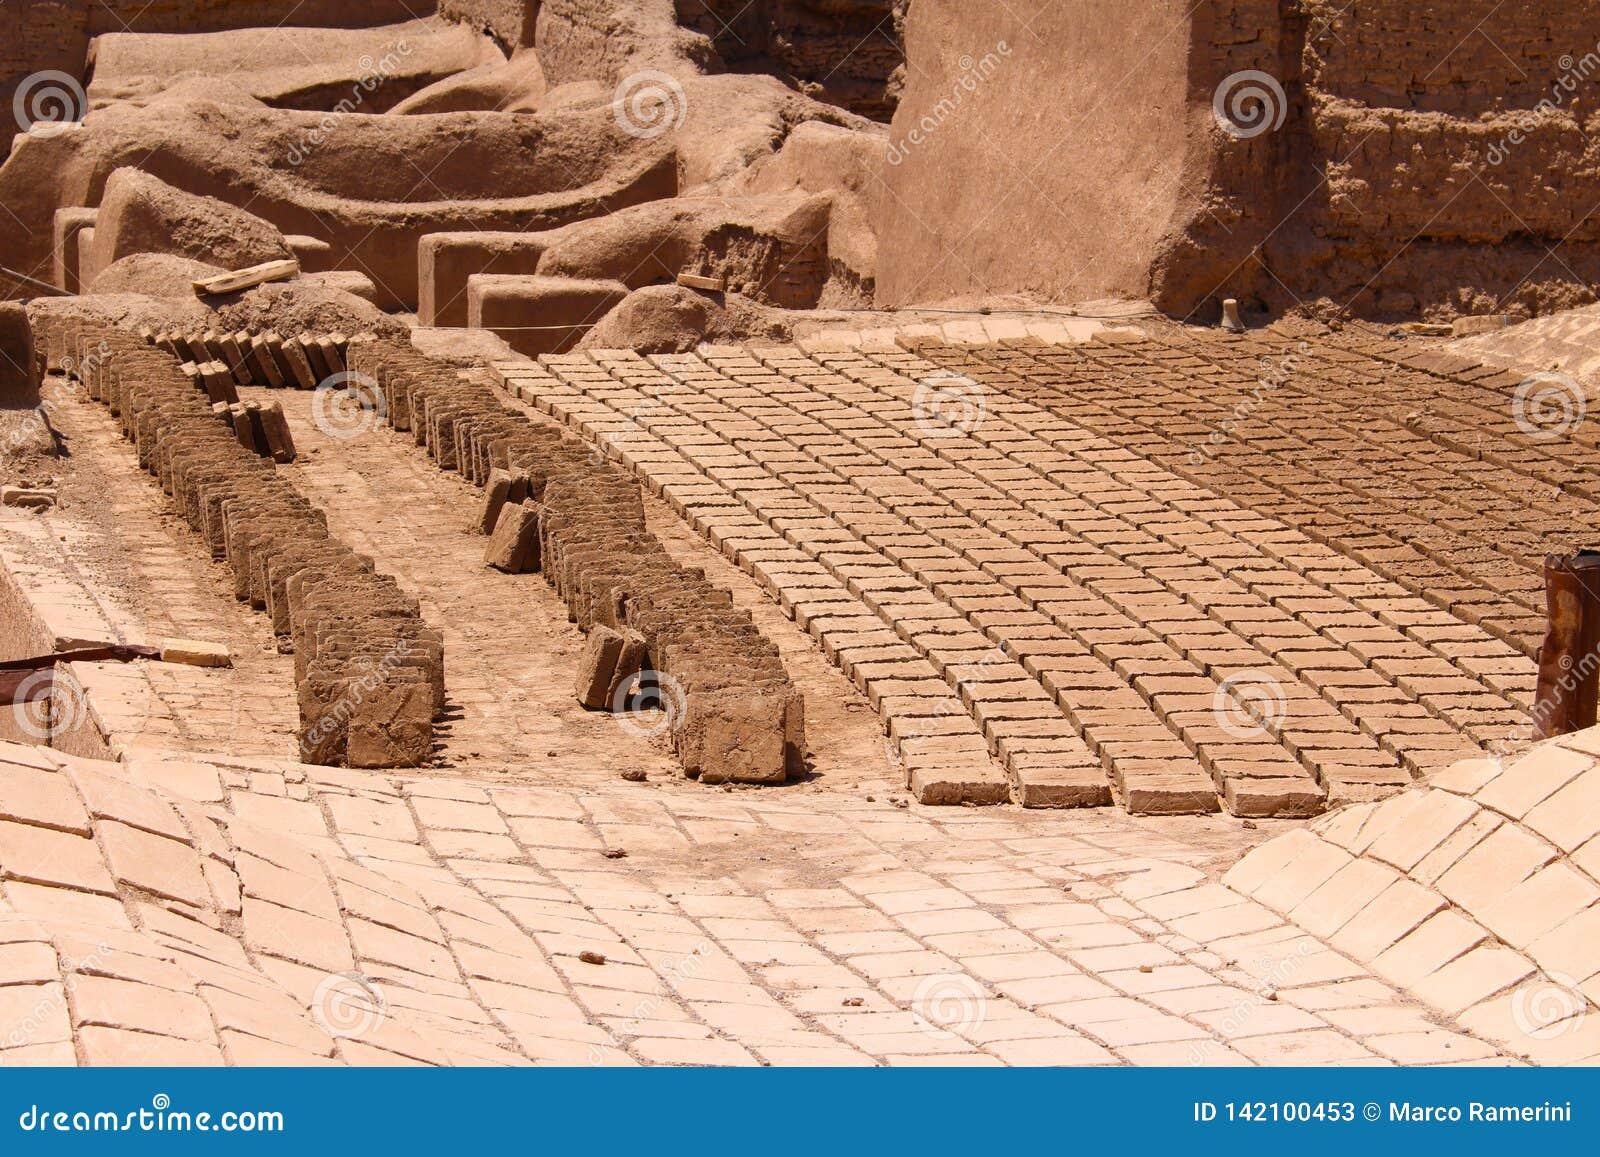 Bricks baked in the sun in the city of Rayen, Iran